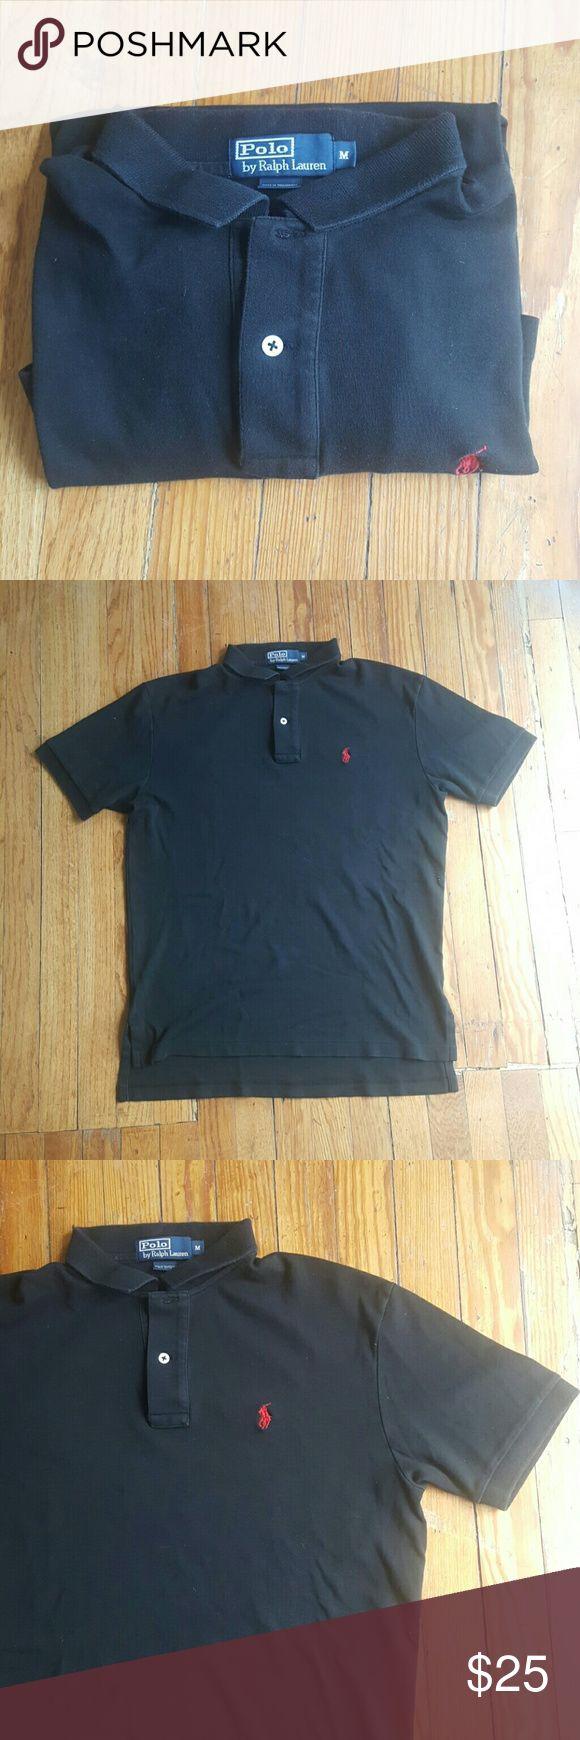 POLO BY RALPH LAUREN BLACK POLO SHIRT M POLO BY RALPH LAUREN BLACK POLO SHIRT LIKE NEW MEDIUM Polo by Ralph Lauren Shirts Polos